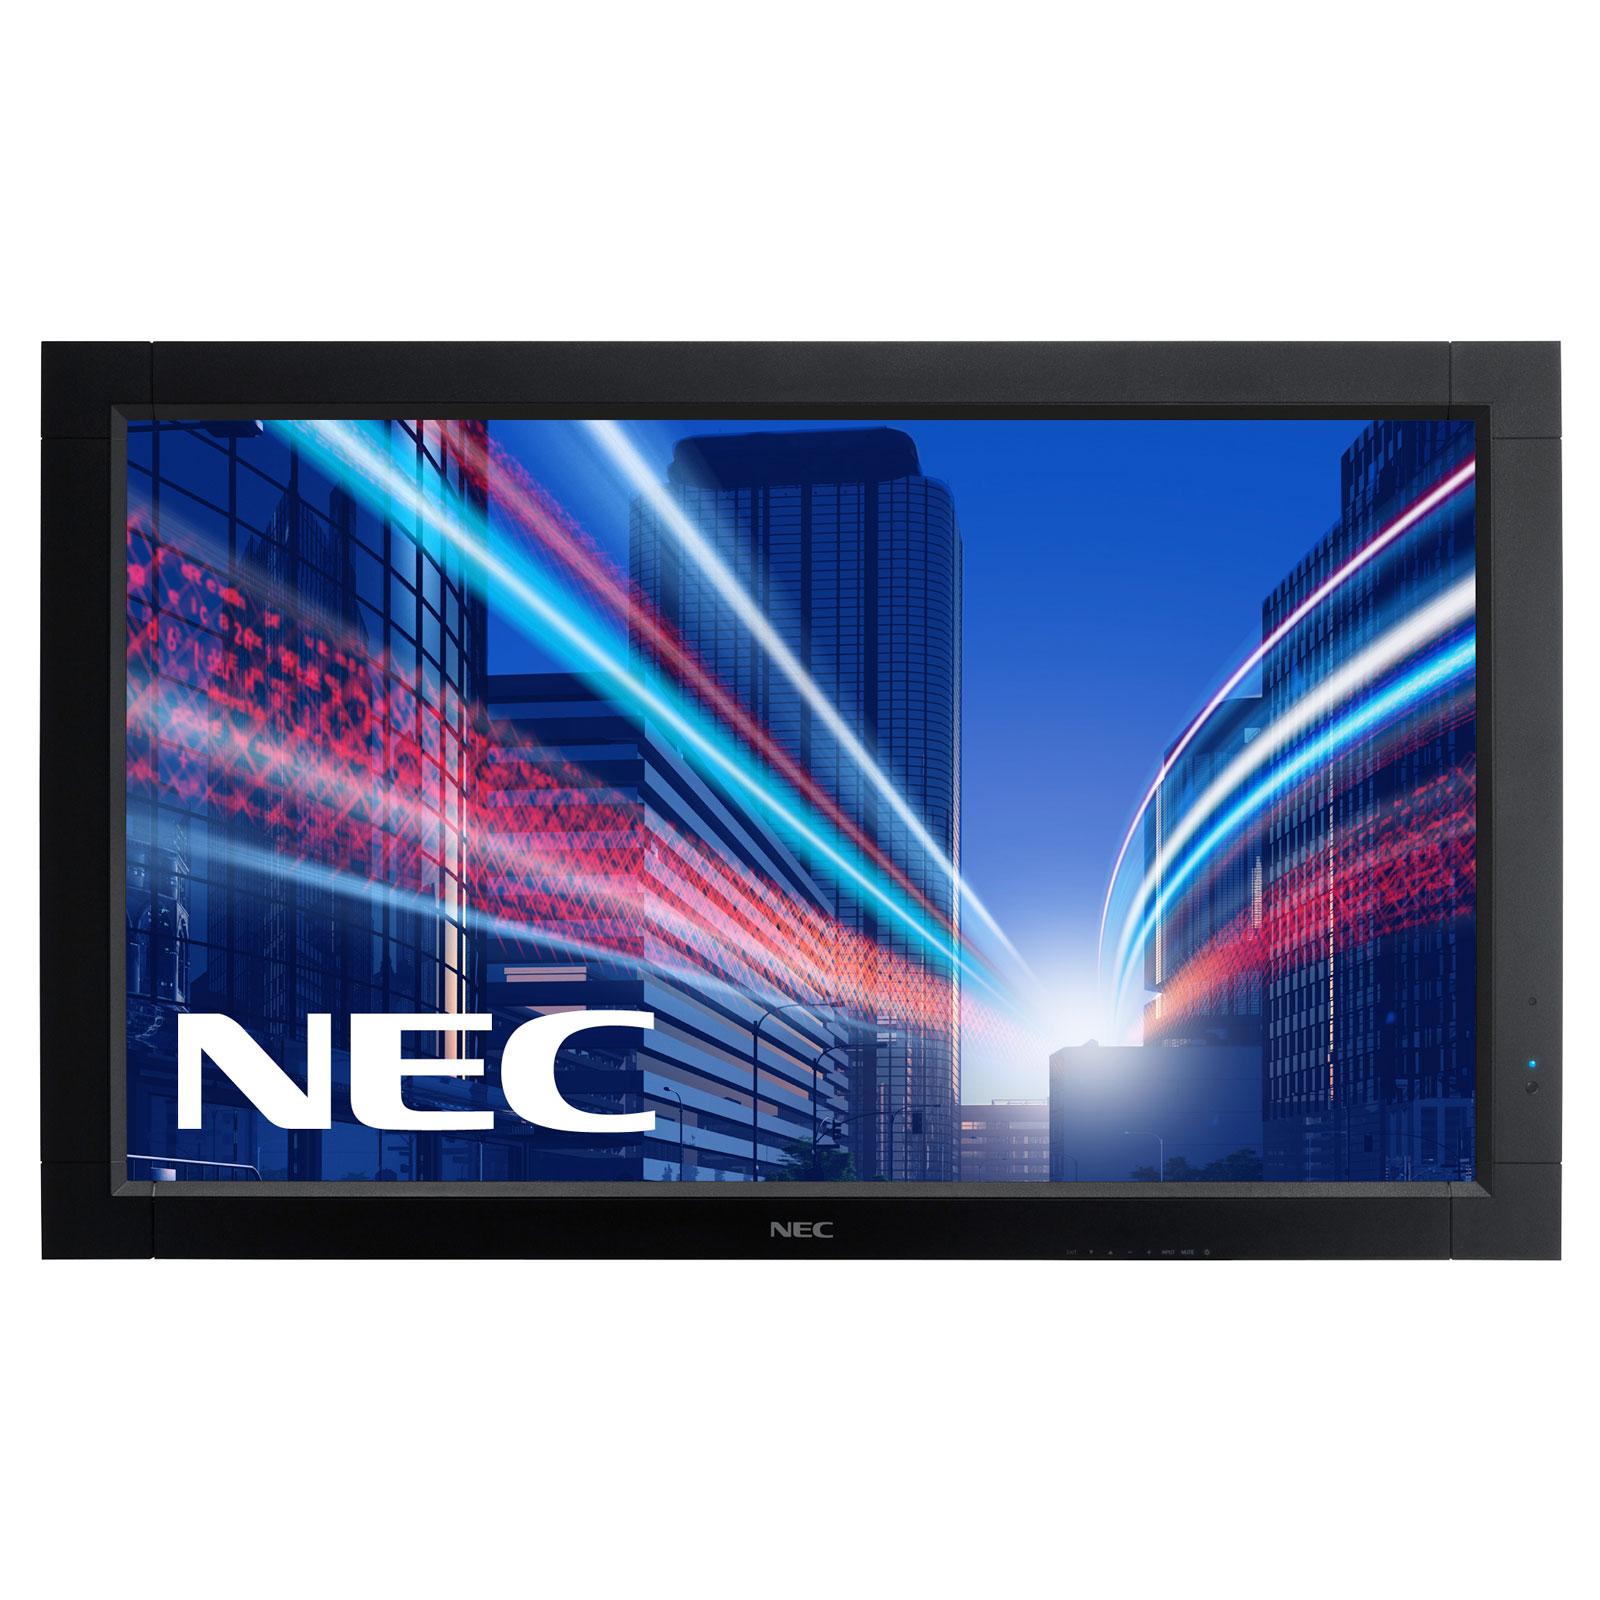 Nec 32 multisync v323 ecran dynamique nec sur for Ecran photo nec